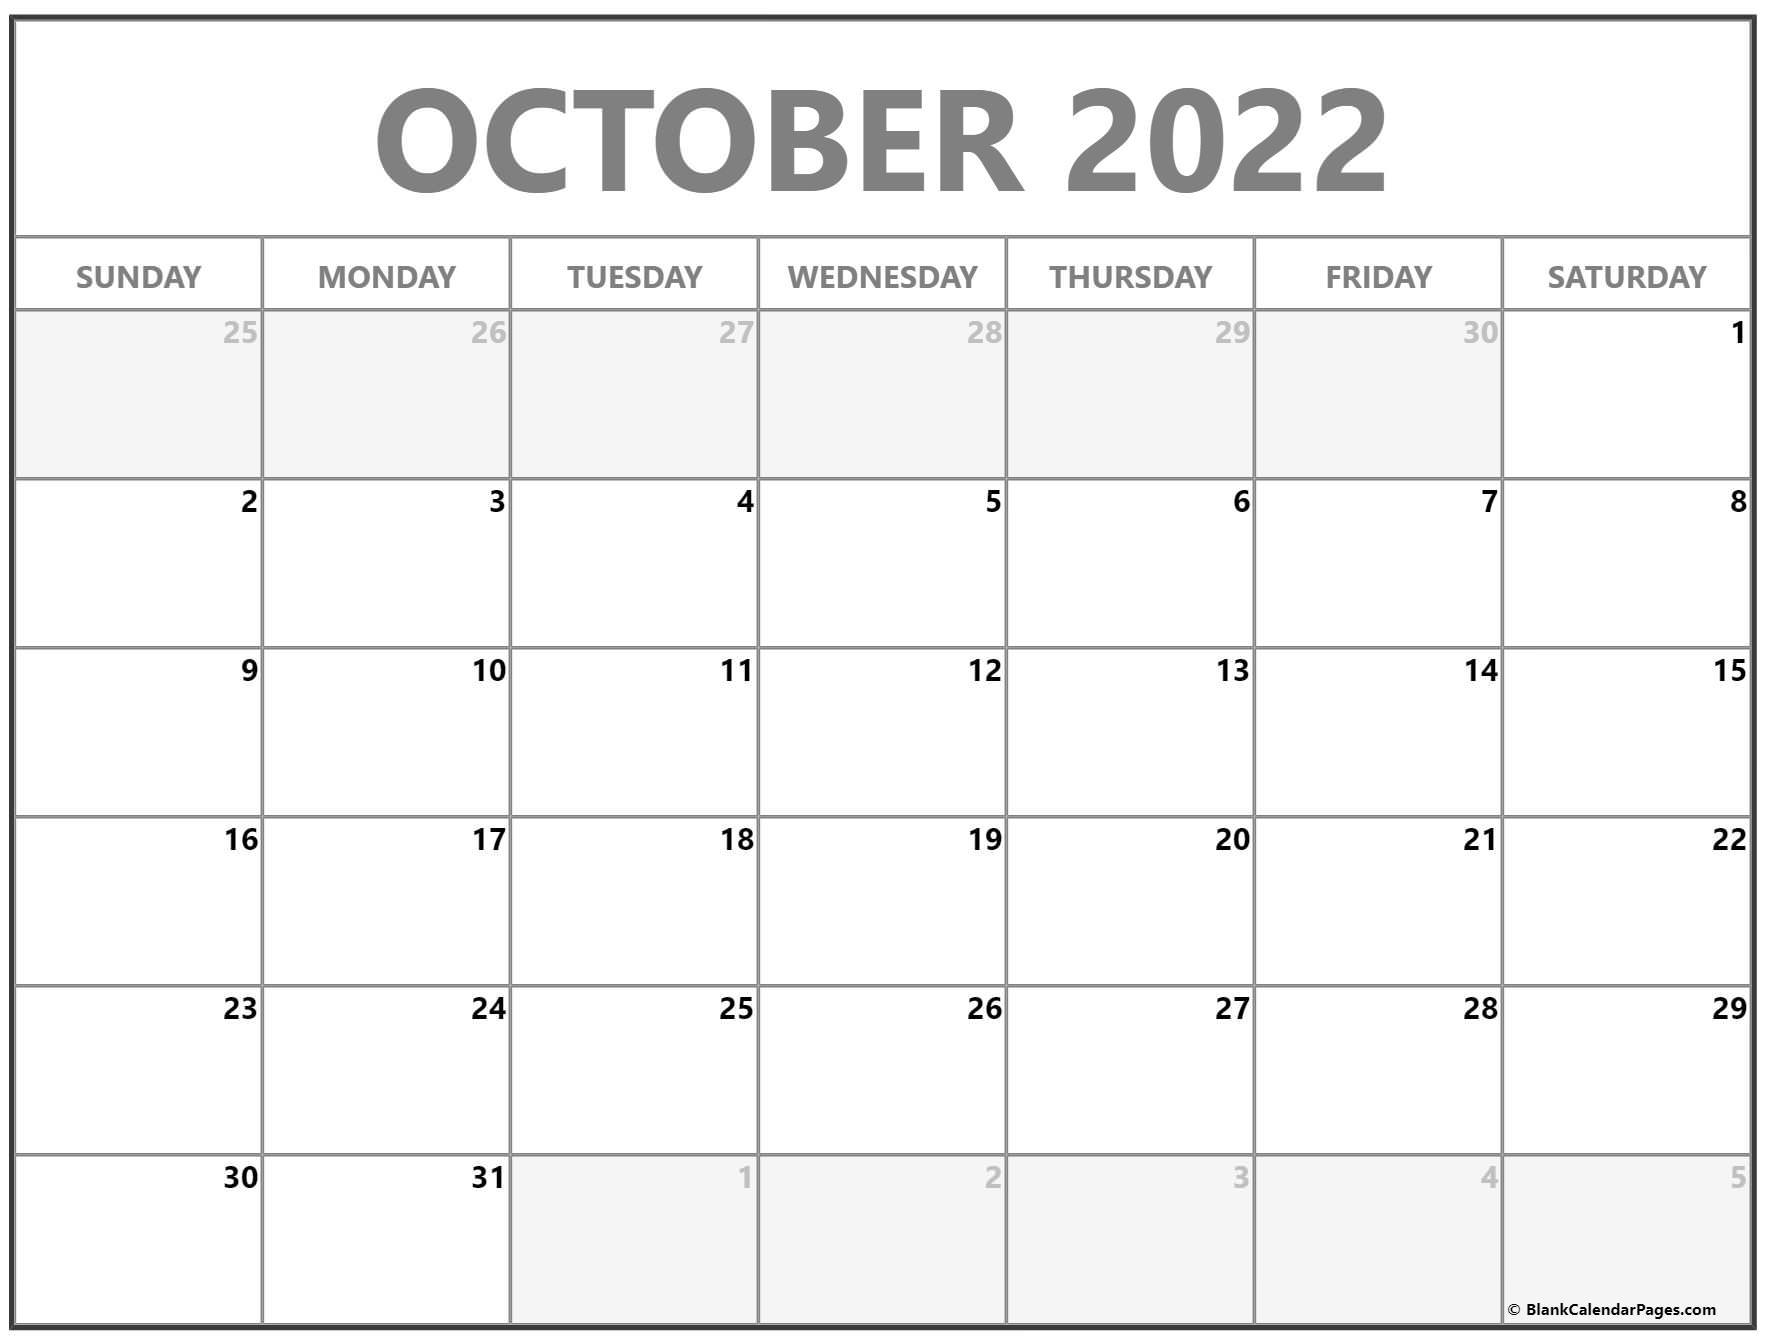 October 2022 calendar | free printable monthly calendars